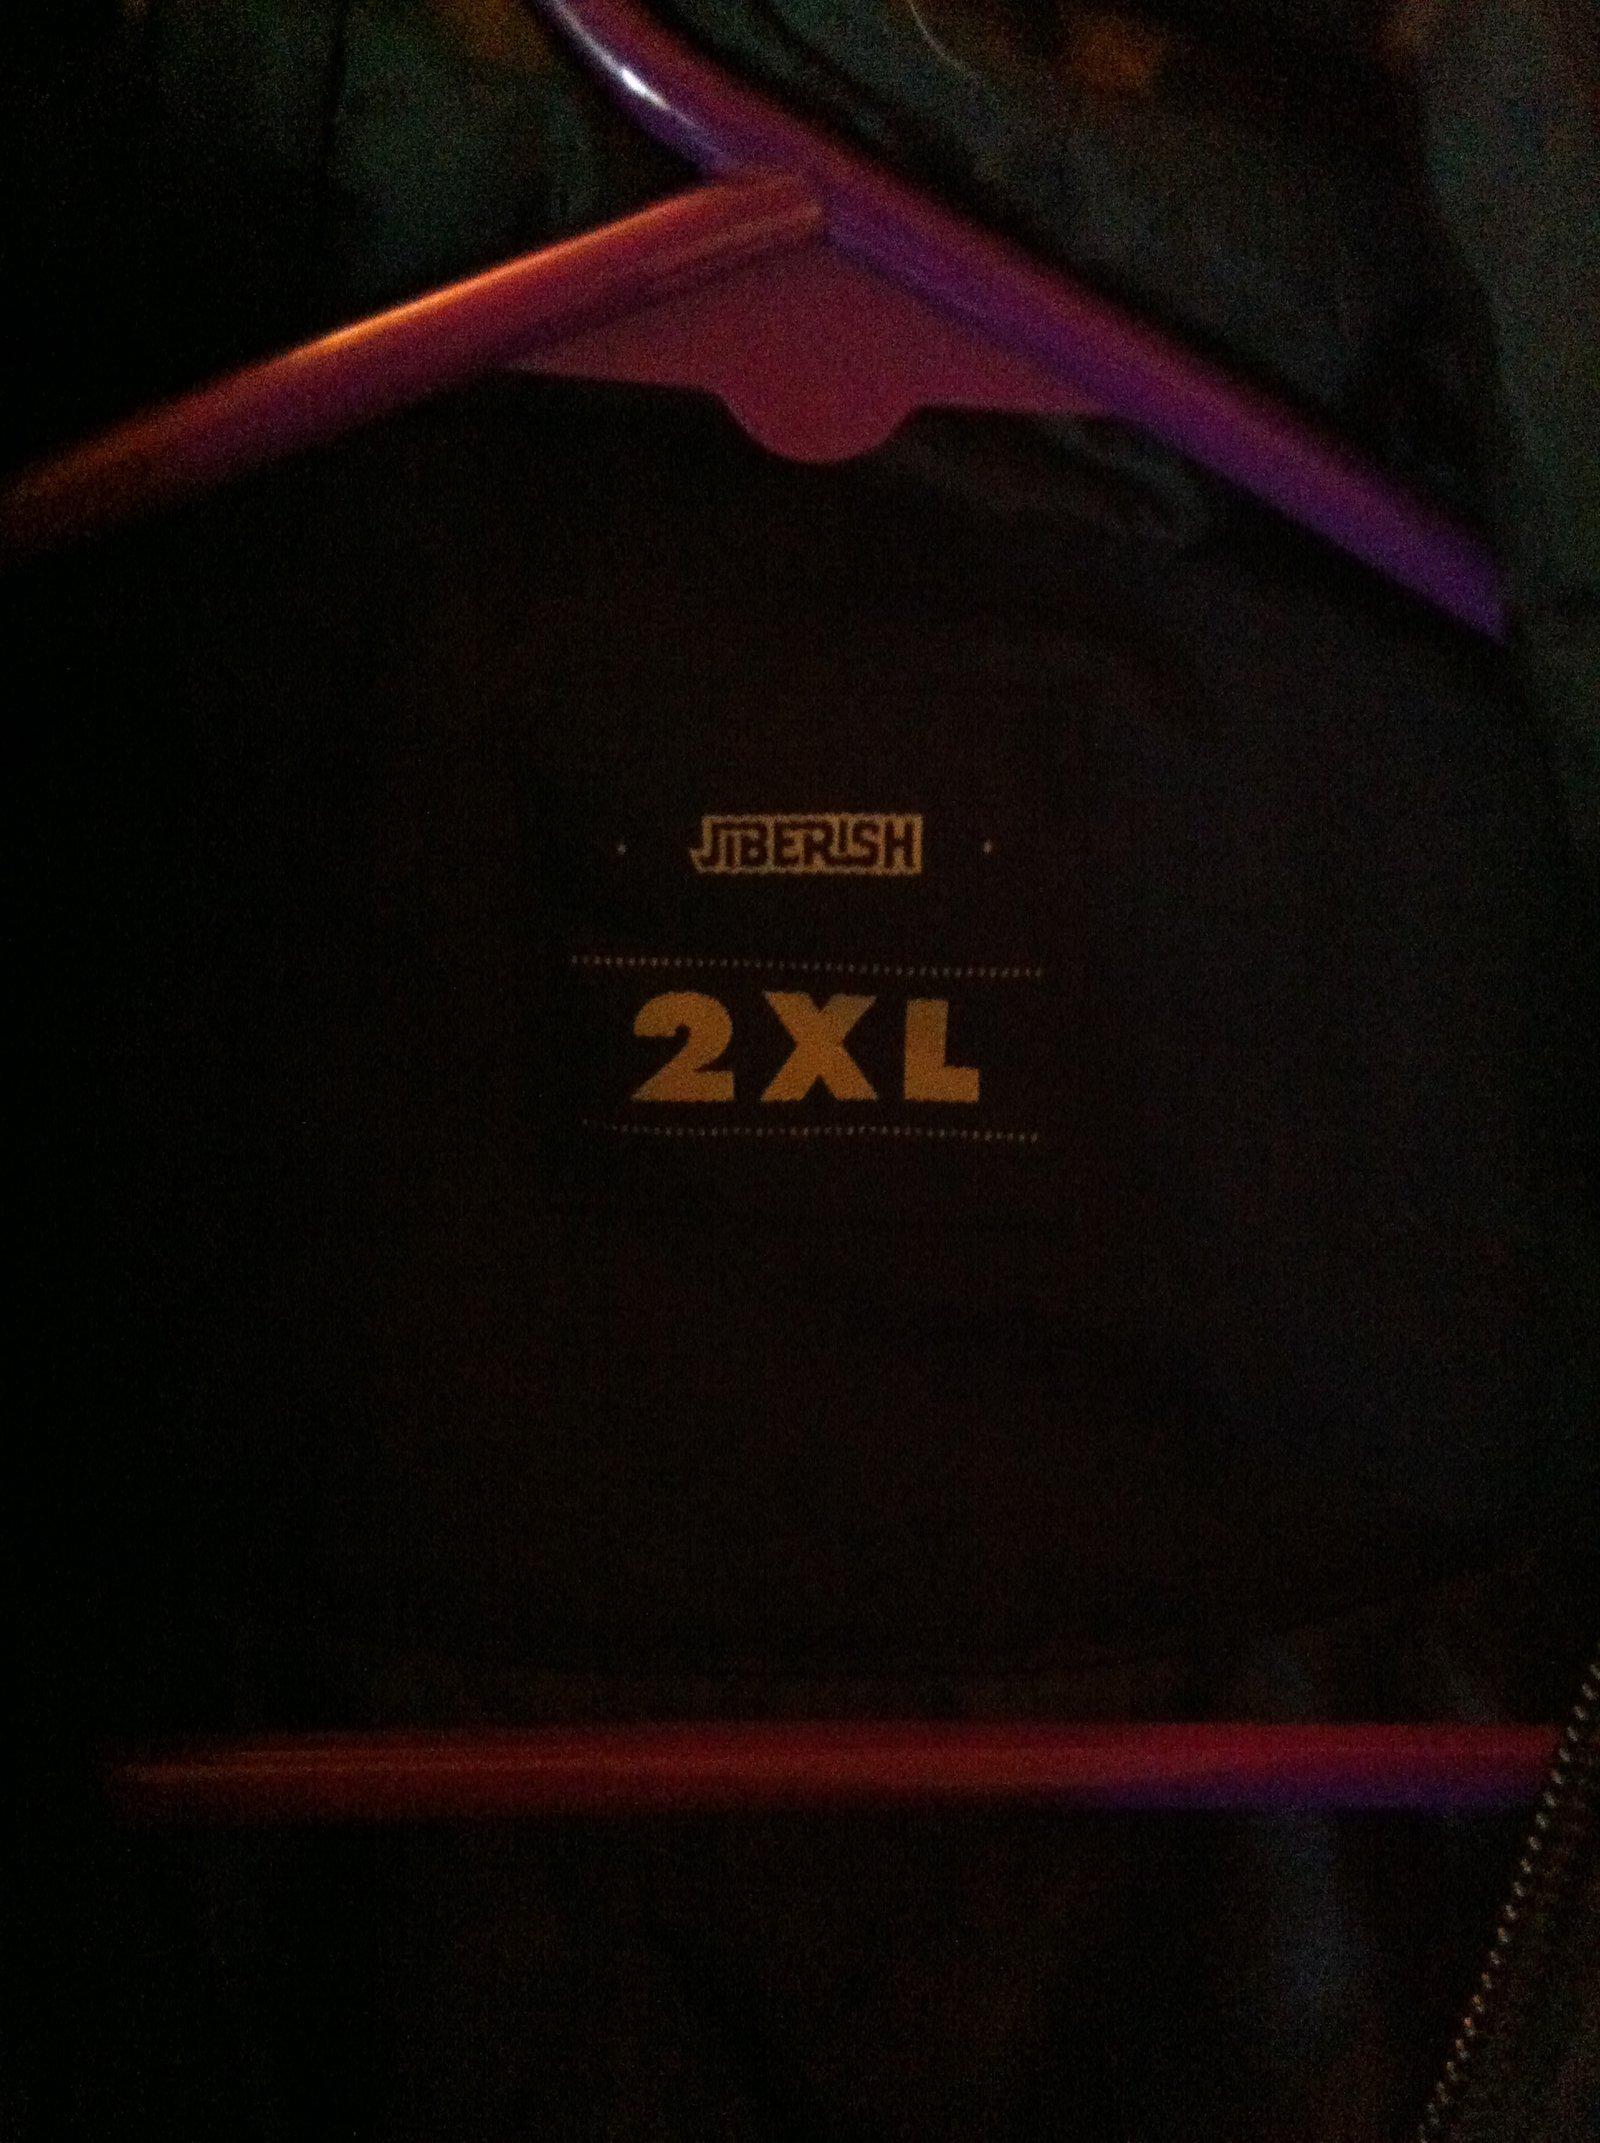 2XL cloudcover tag